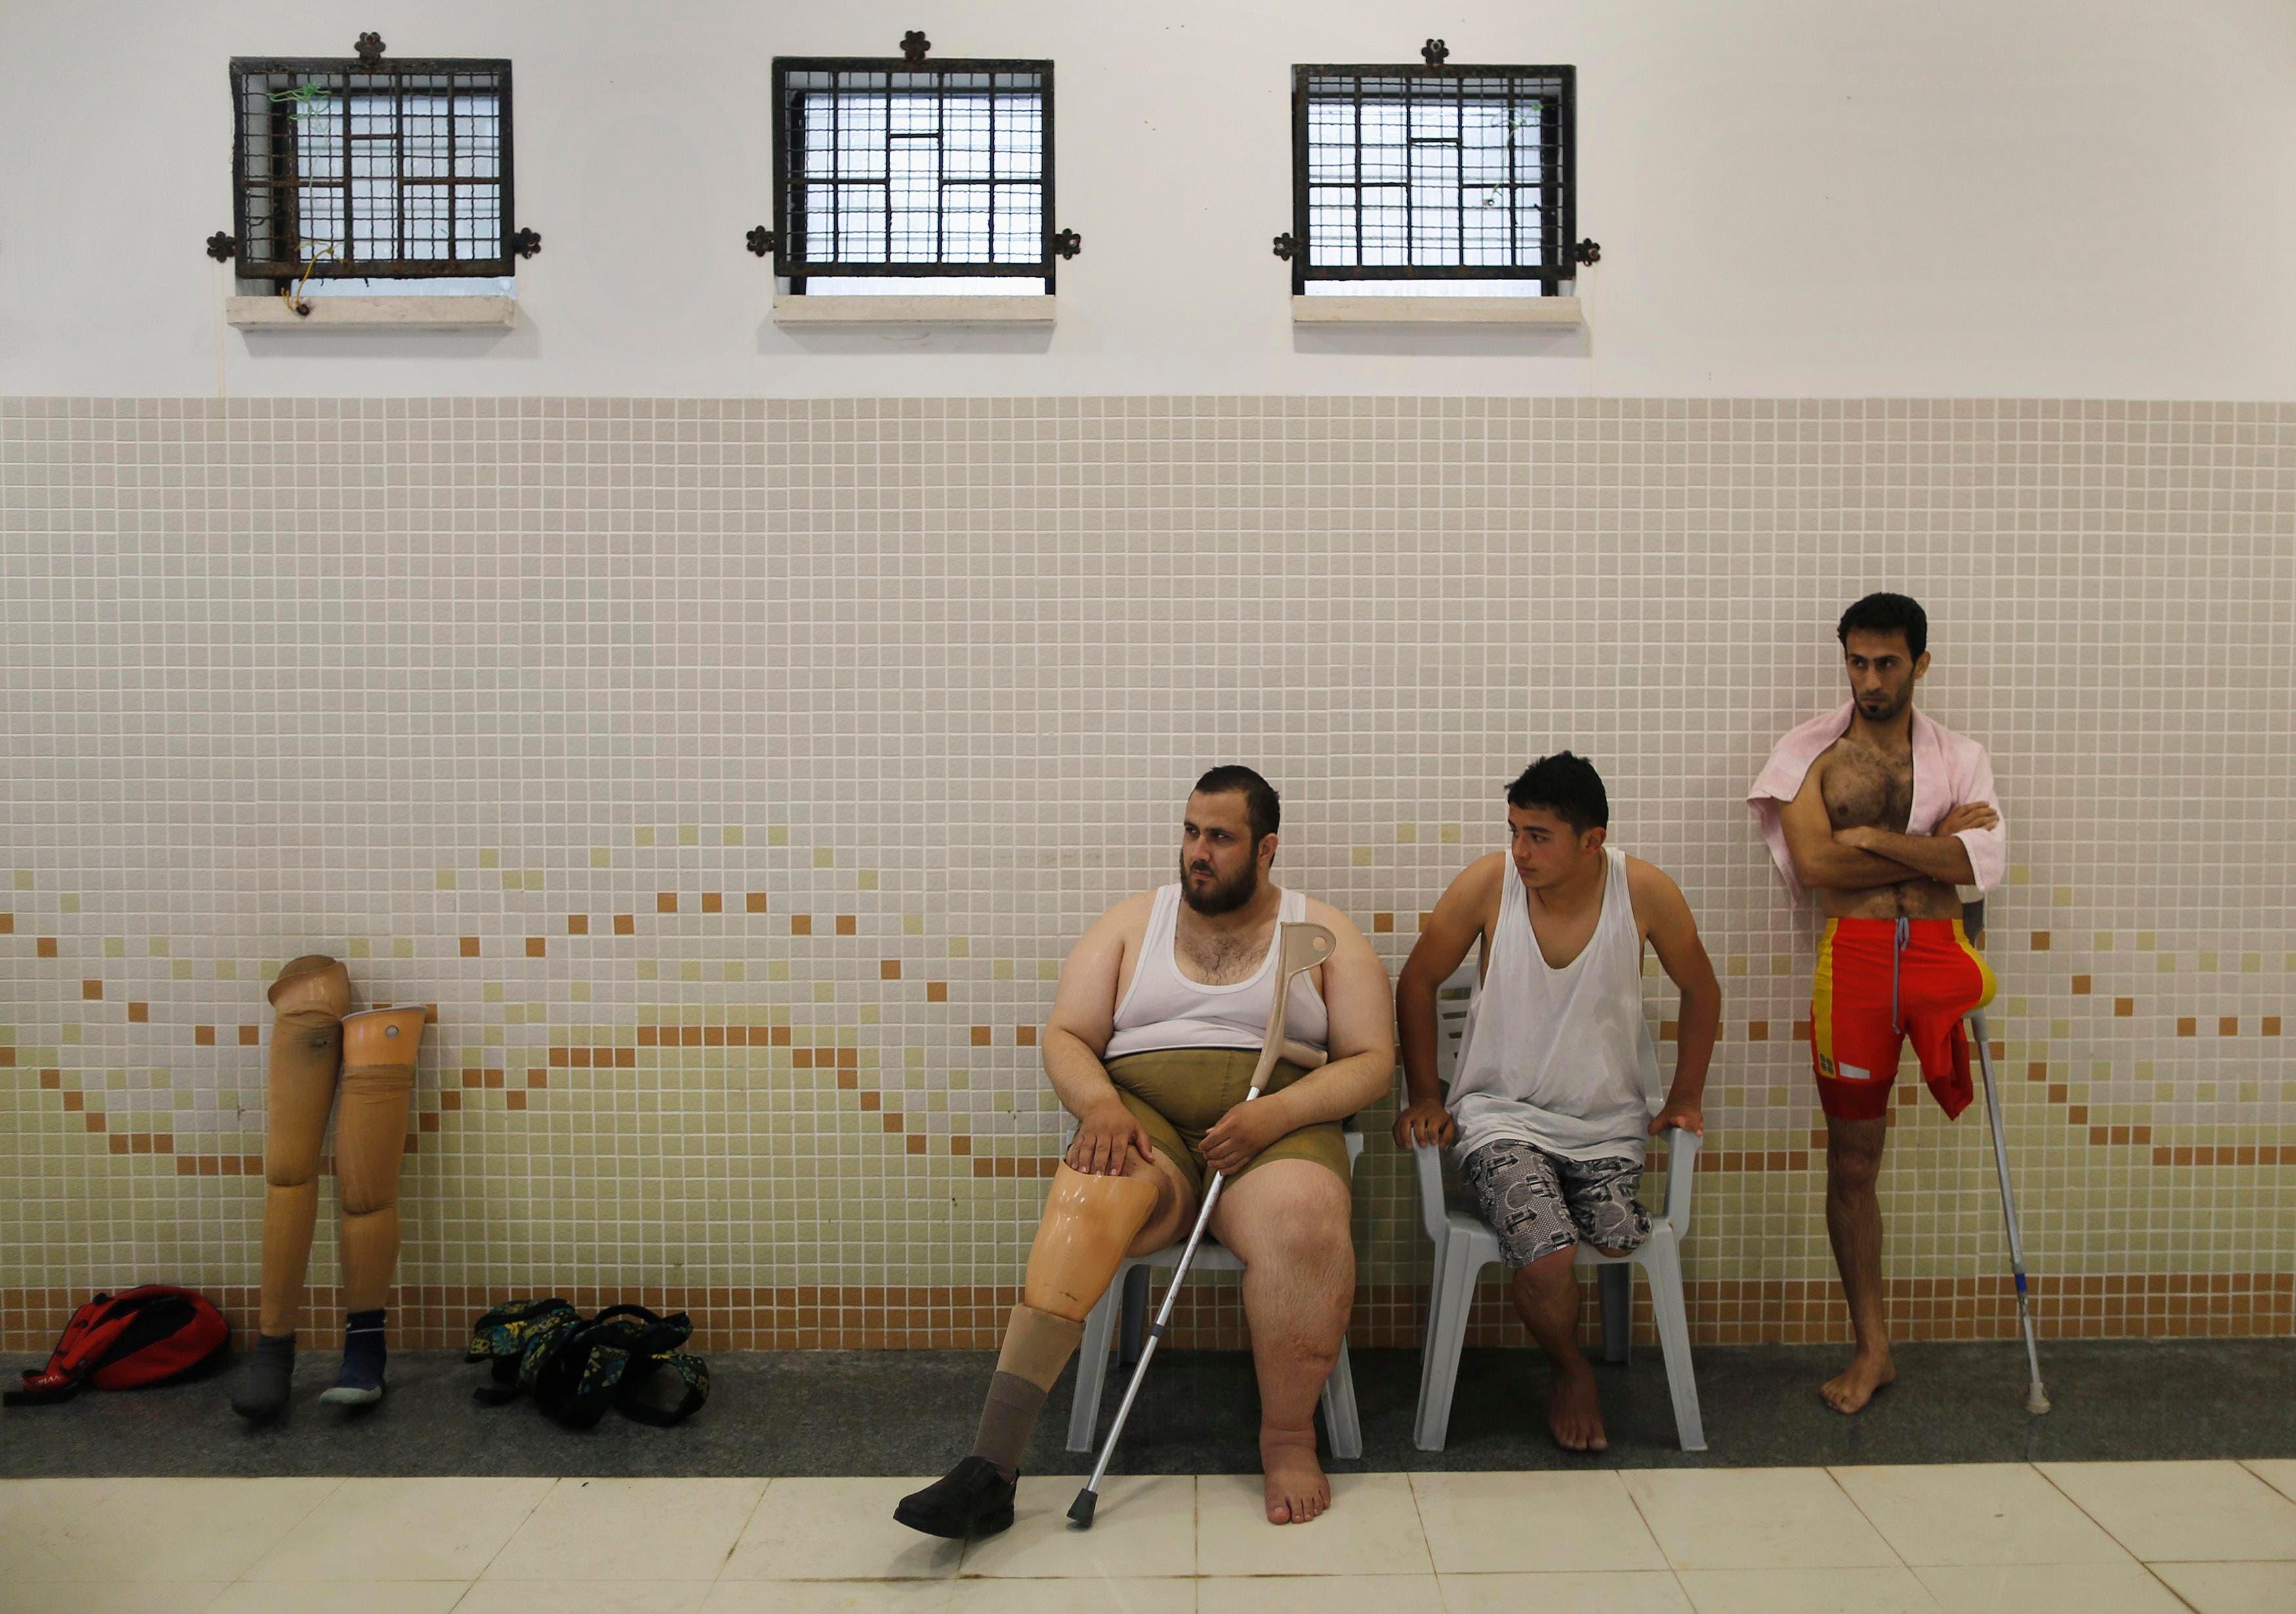 Gaza's rehabilitation center